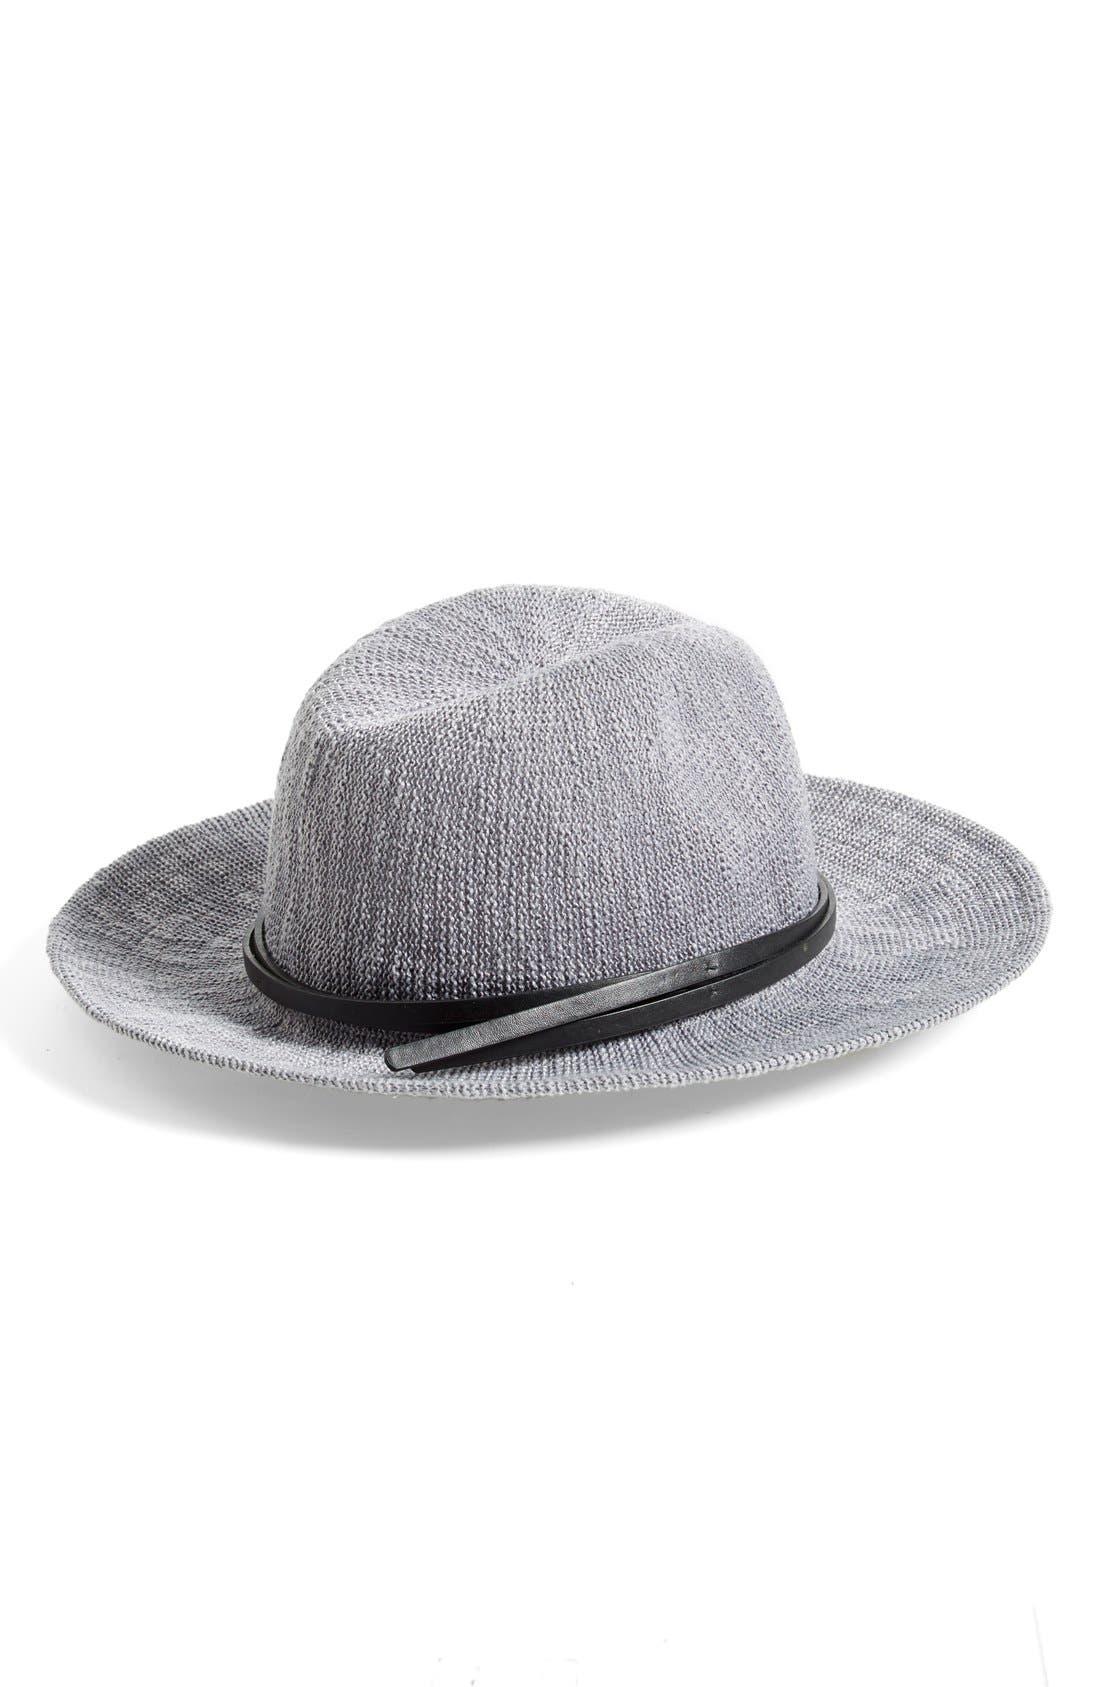 Main Image - Phase 3 Knit Wide Brim Hat